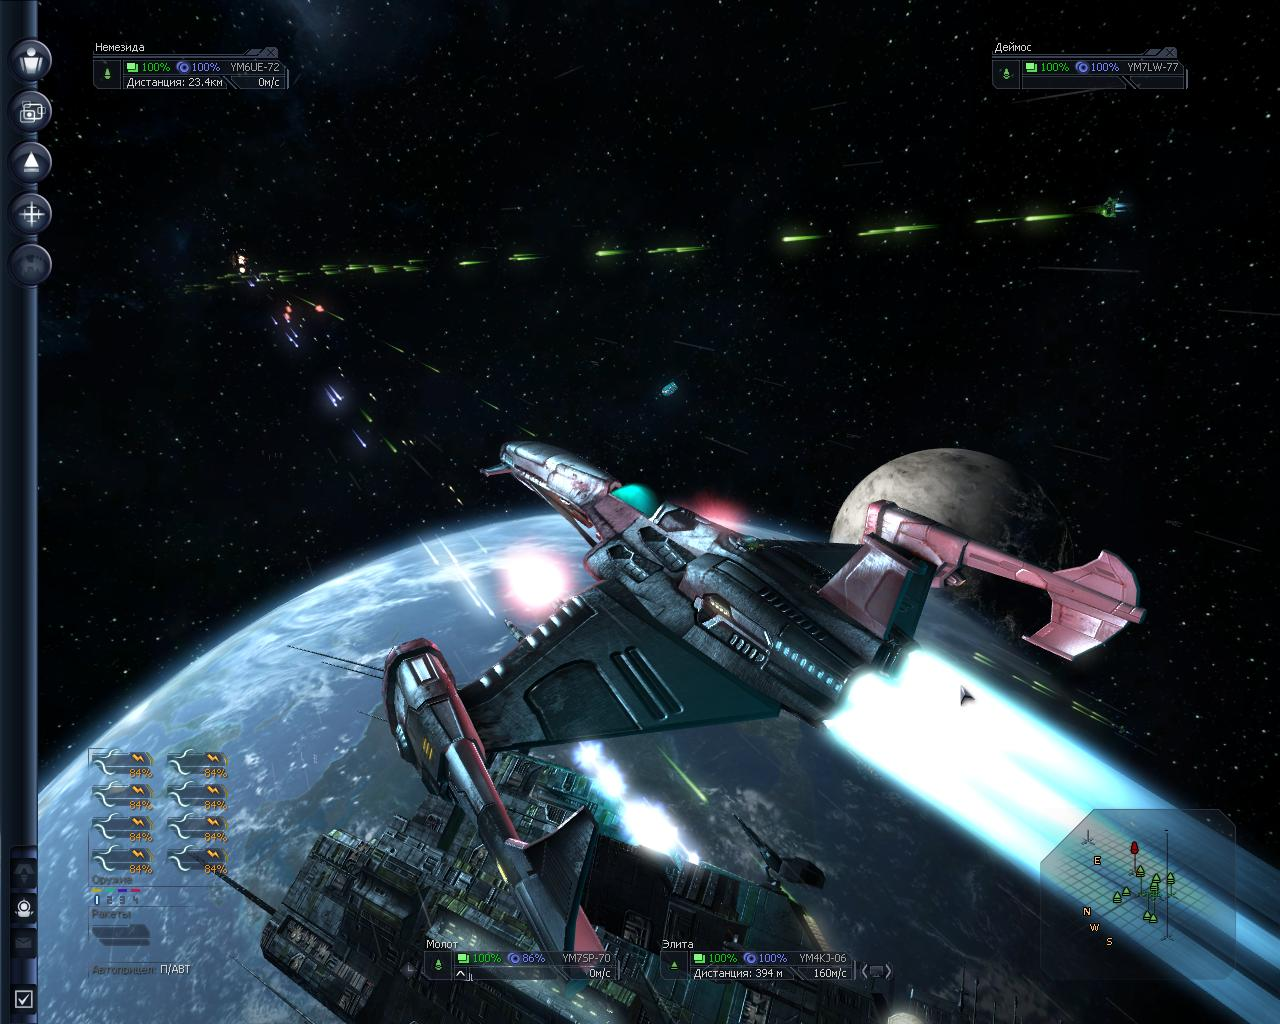 X3 terran conflict free argon trading station ii